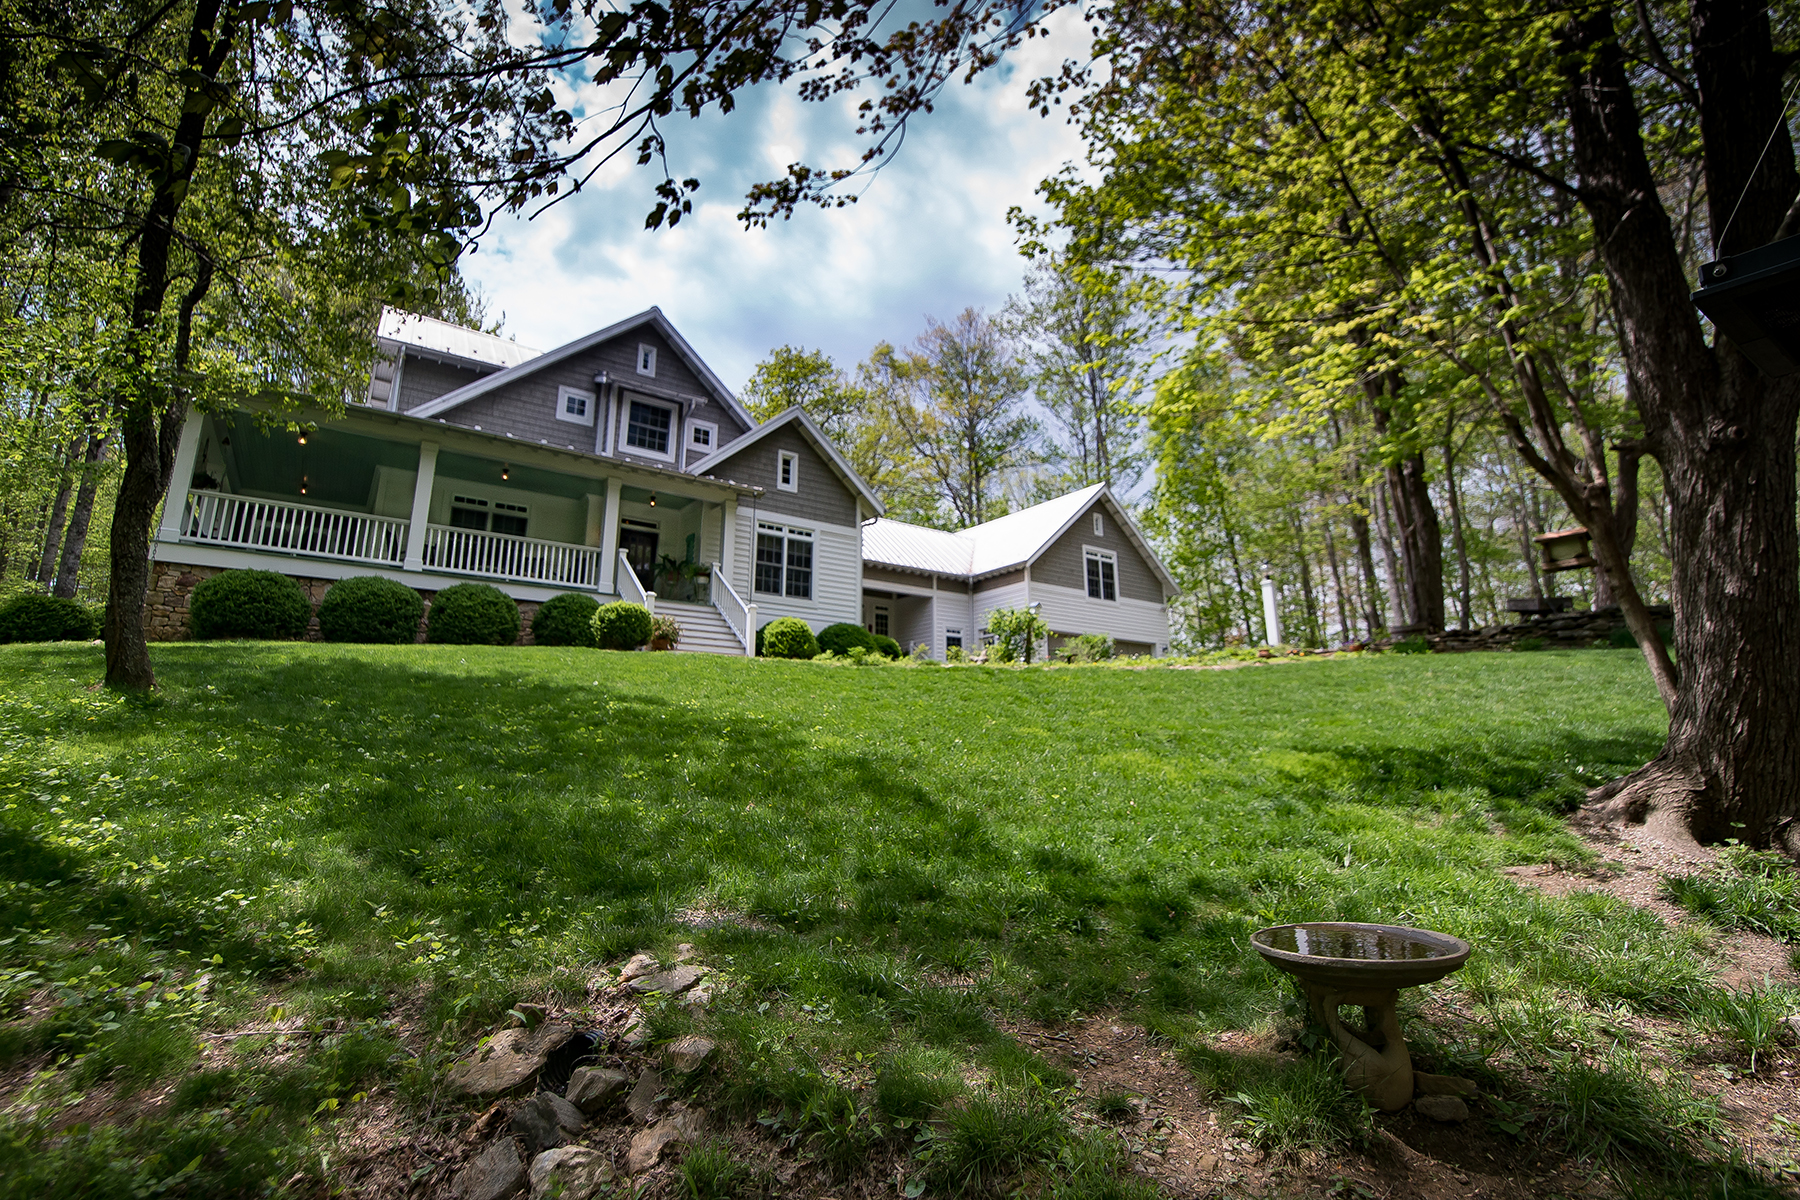 獨棟家庭住宅 為 出售 在 CRUMPLER - THE RIDGE AT CHESTNUT HILL 225 Deer Thicket Lane Crumpler, 北卡羅來納州, 28617 美國